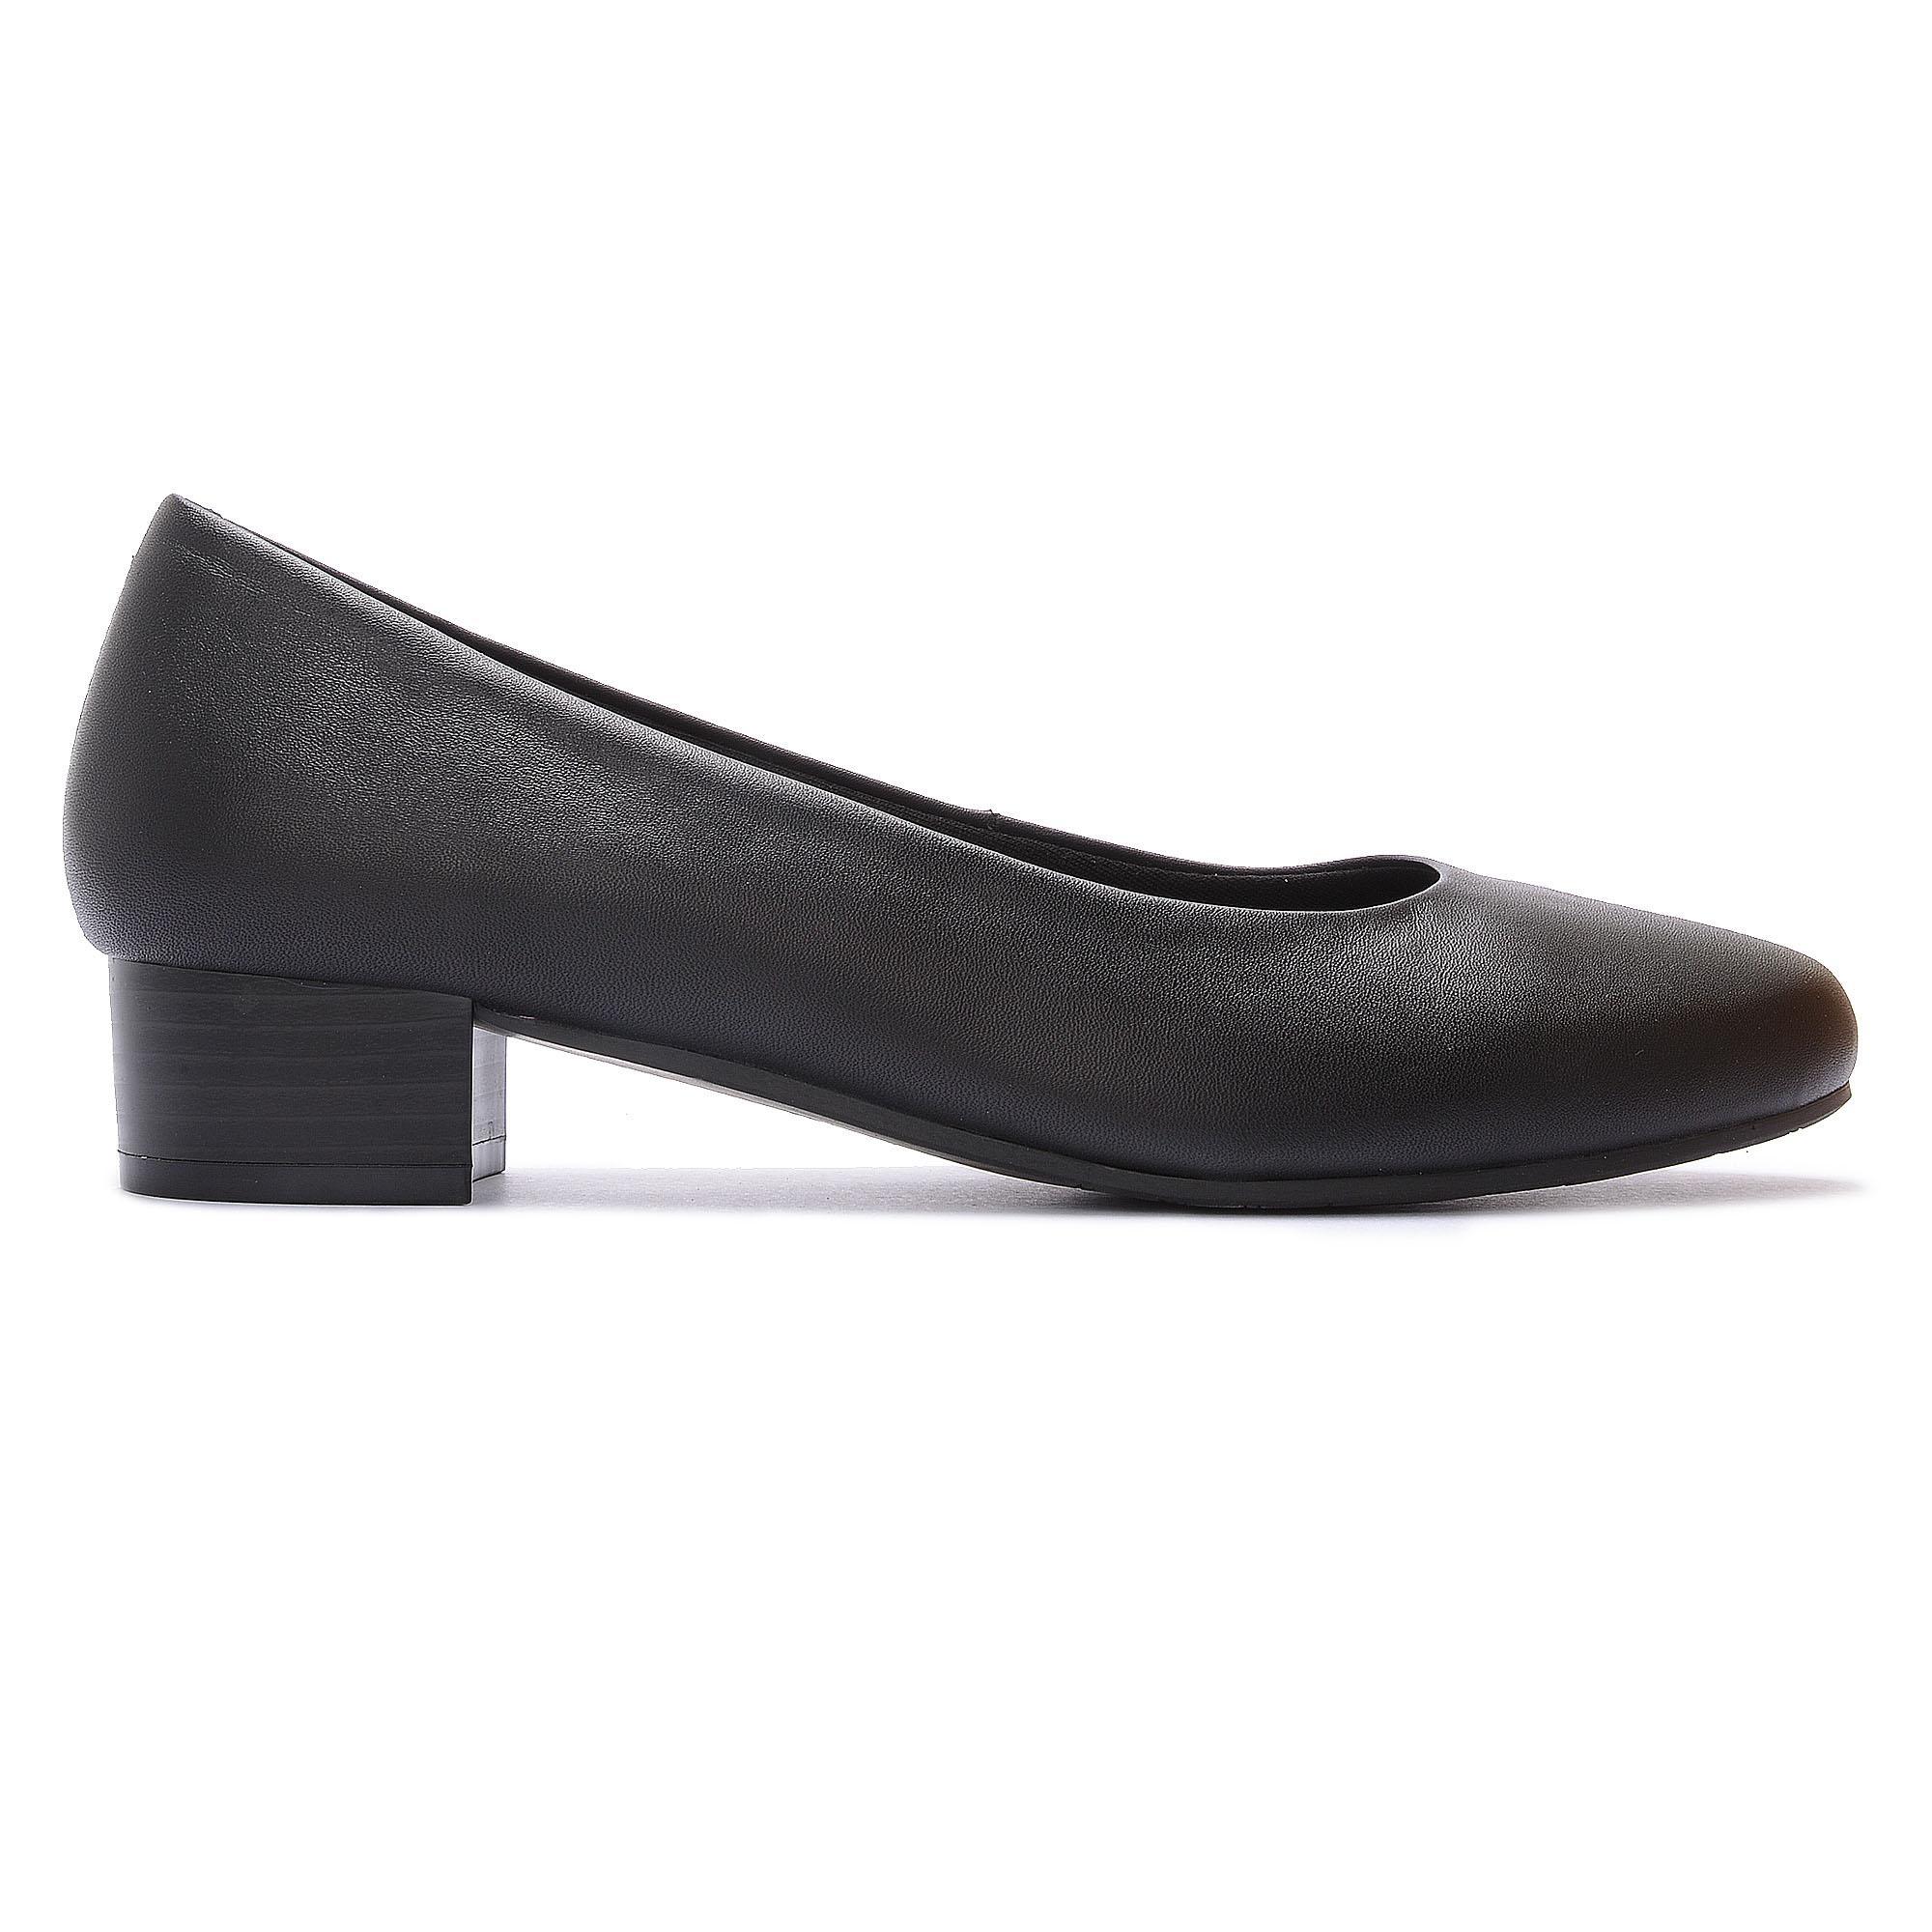 Bata Ladies Heels 6146038 By Bata.